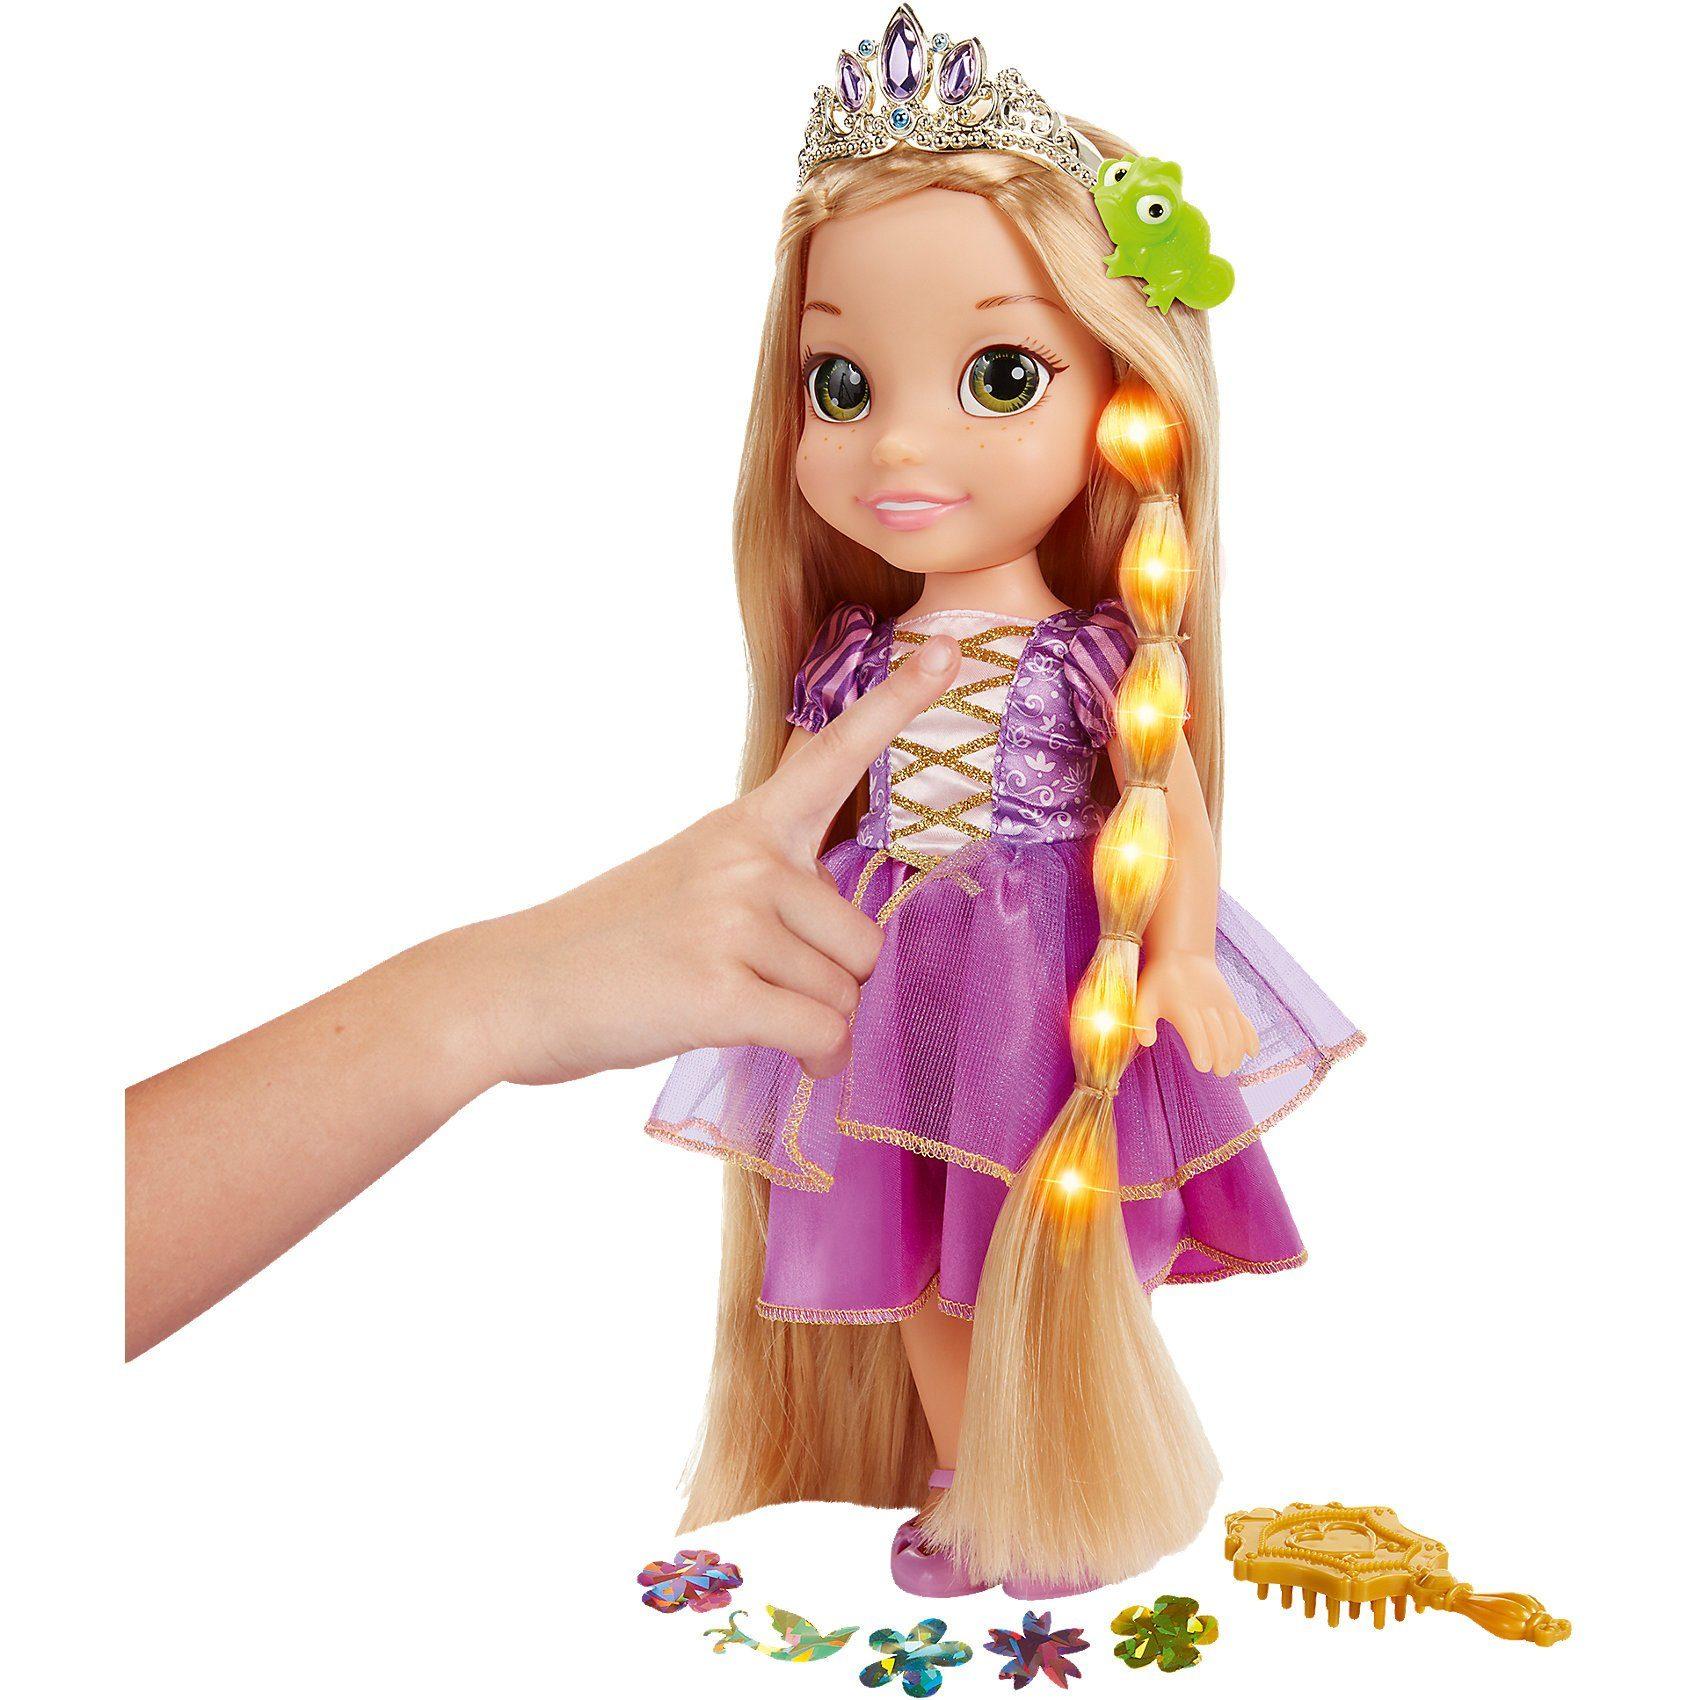 Jakks Pacific Disney Princess Rapunzel Haarglanz Puppe, 35cm